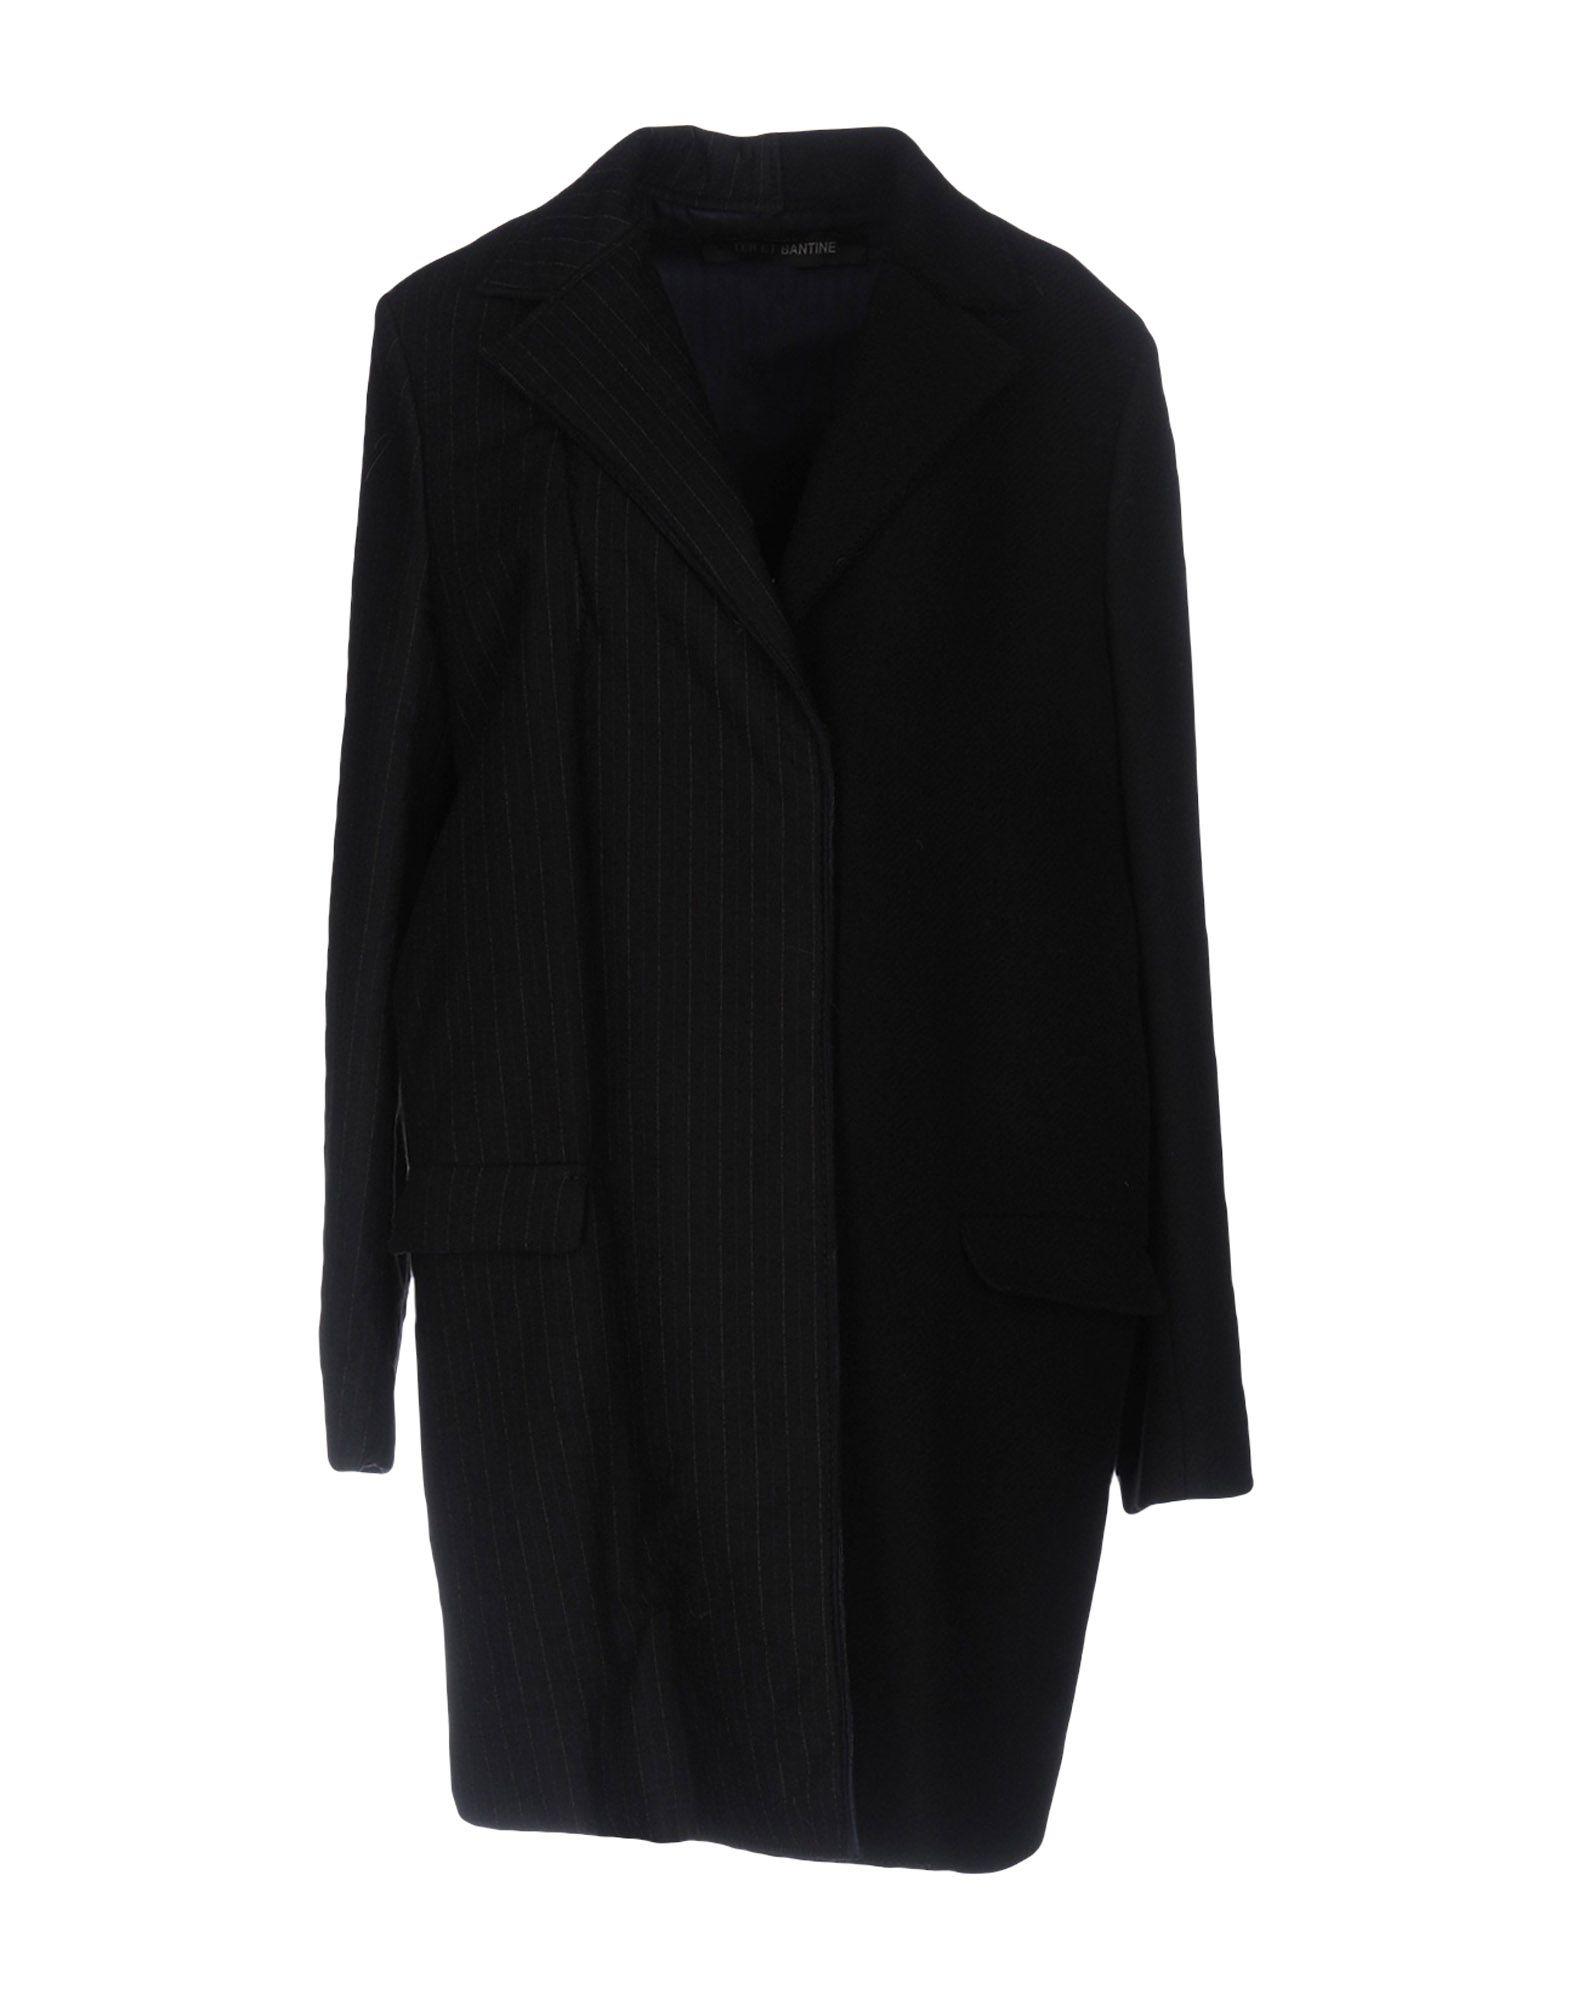 TER ET BANTINE Coat in Black